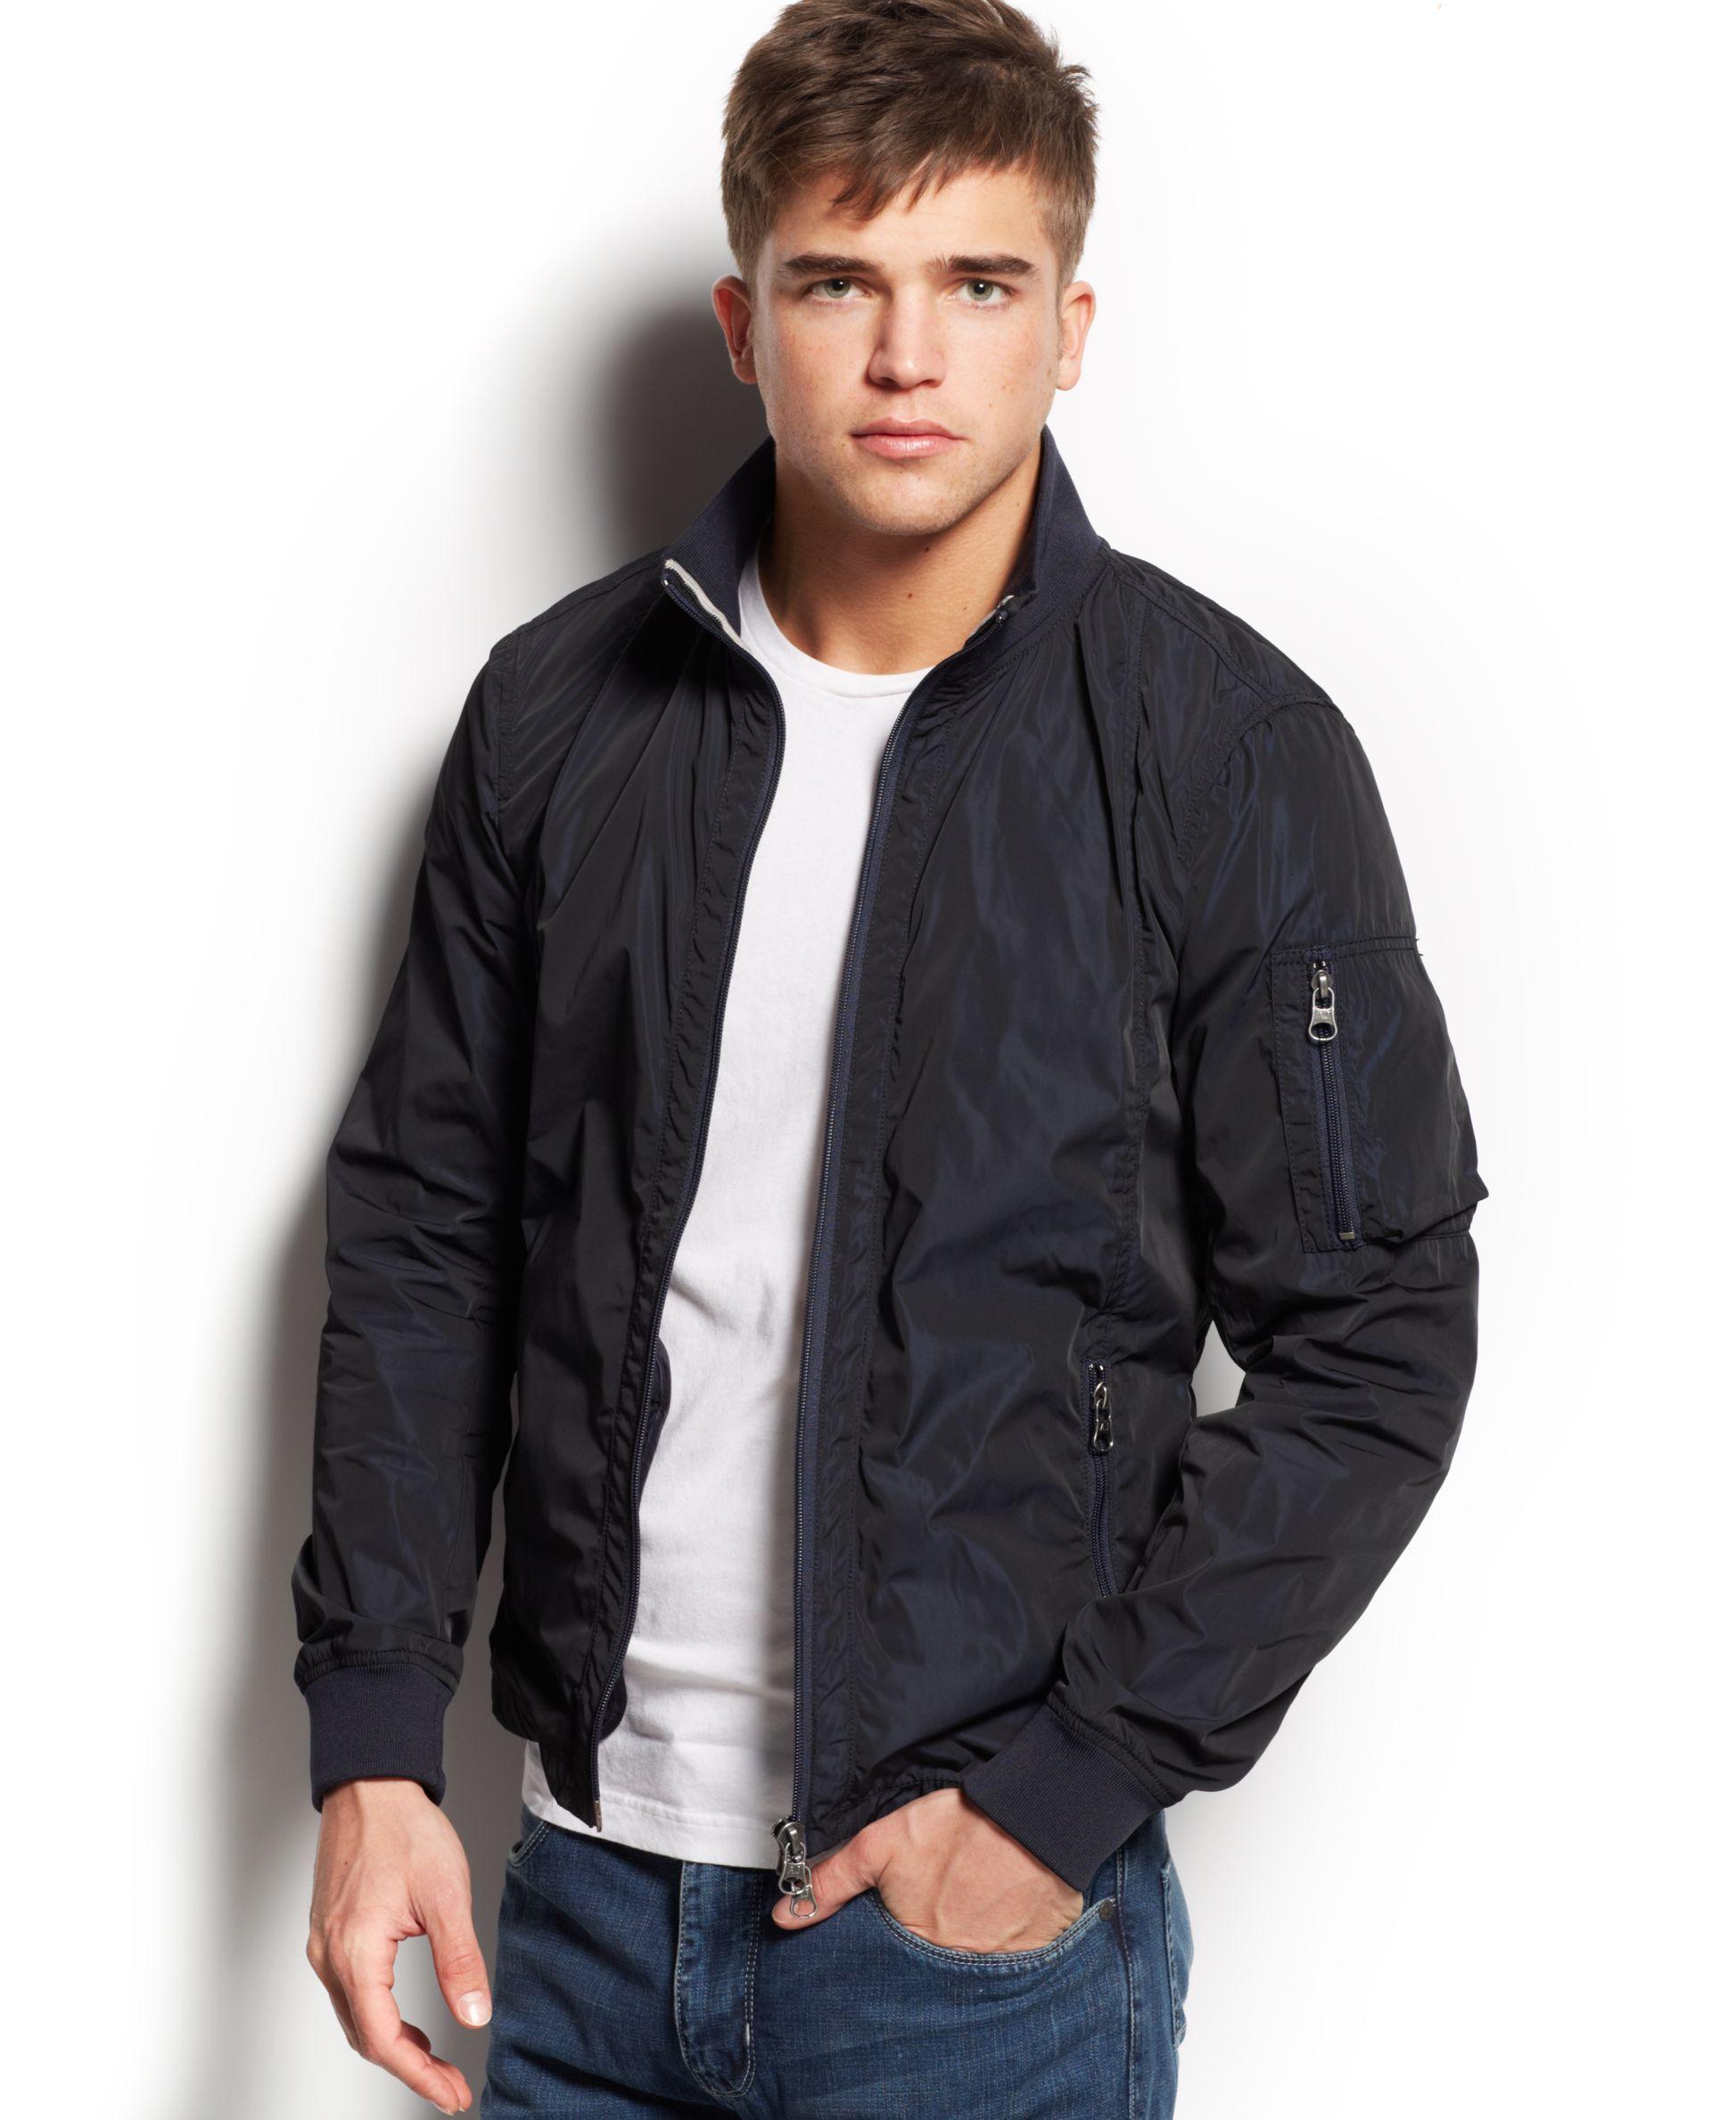 Armani Jeans Iridescent Bomber Jacket